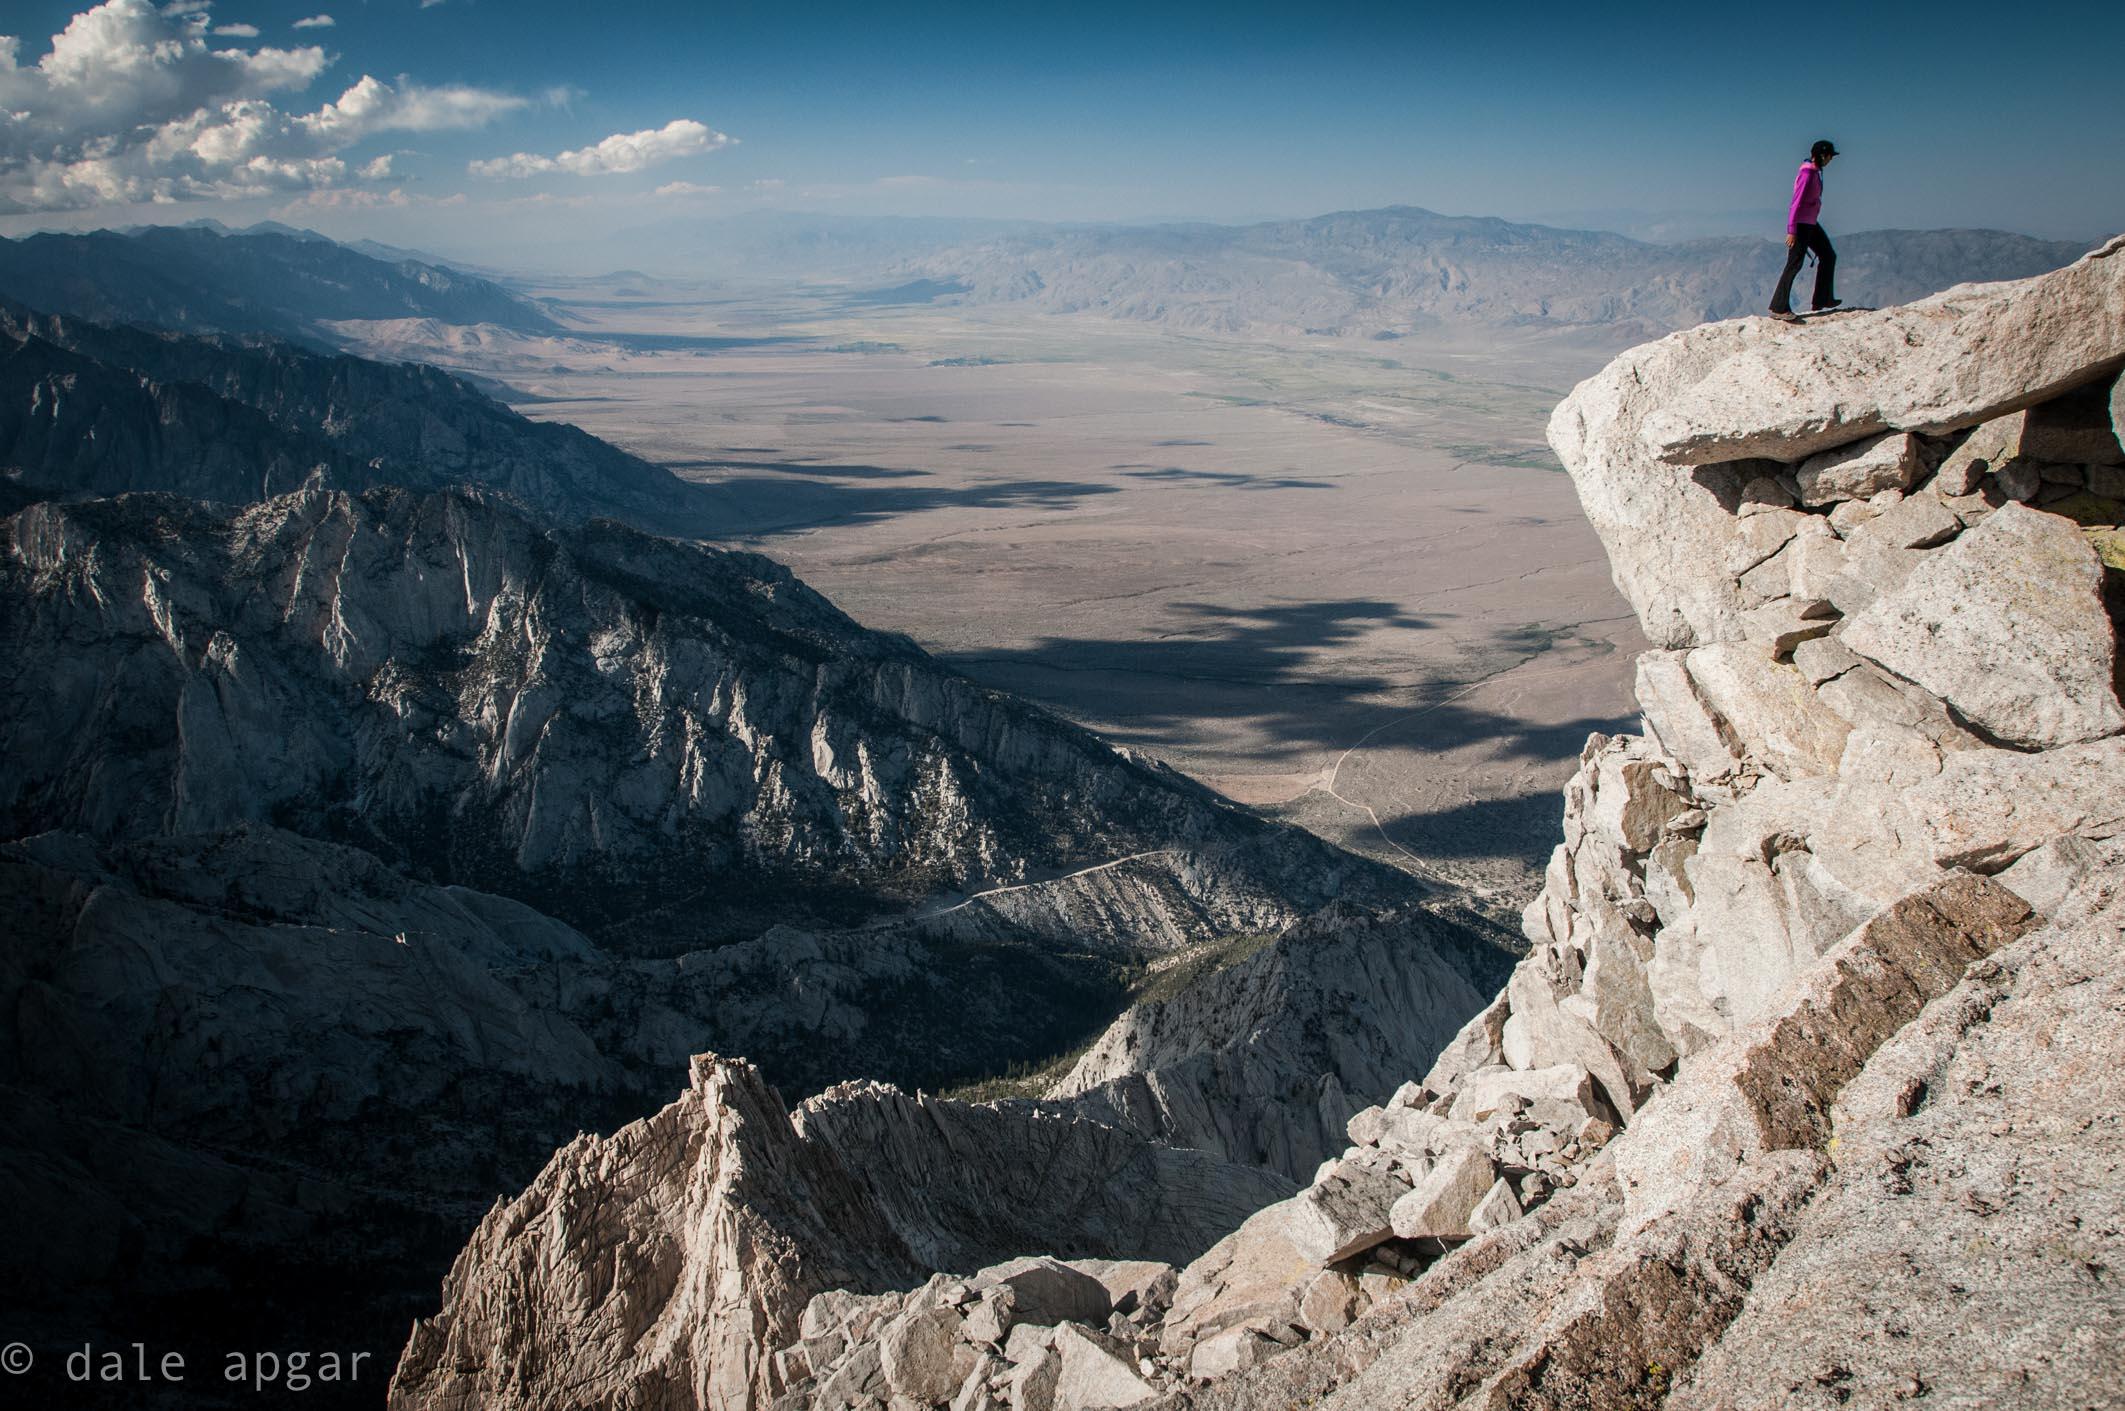 Summit of Lone Pine Peak